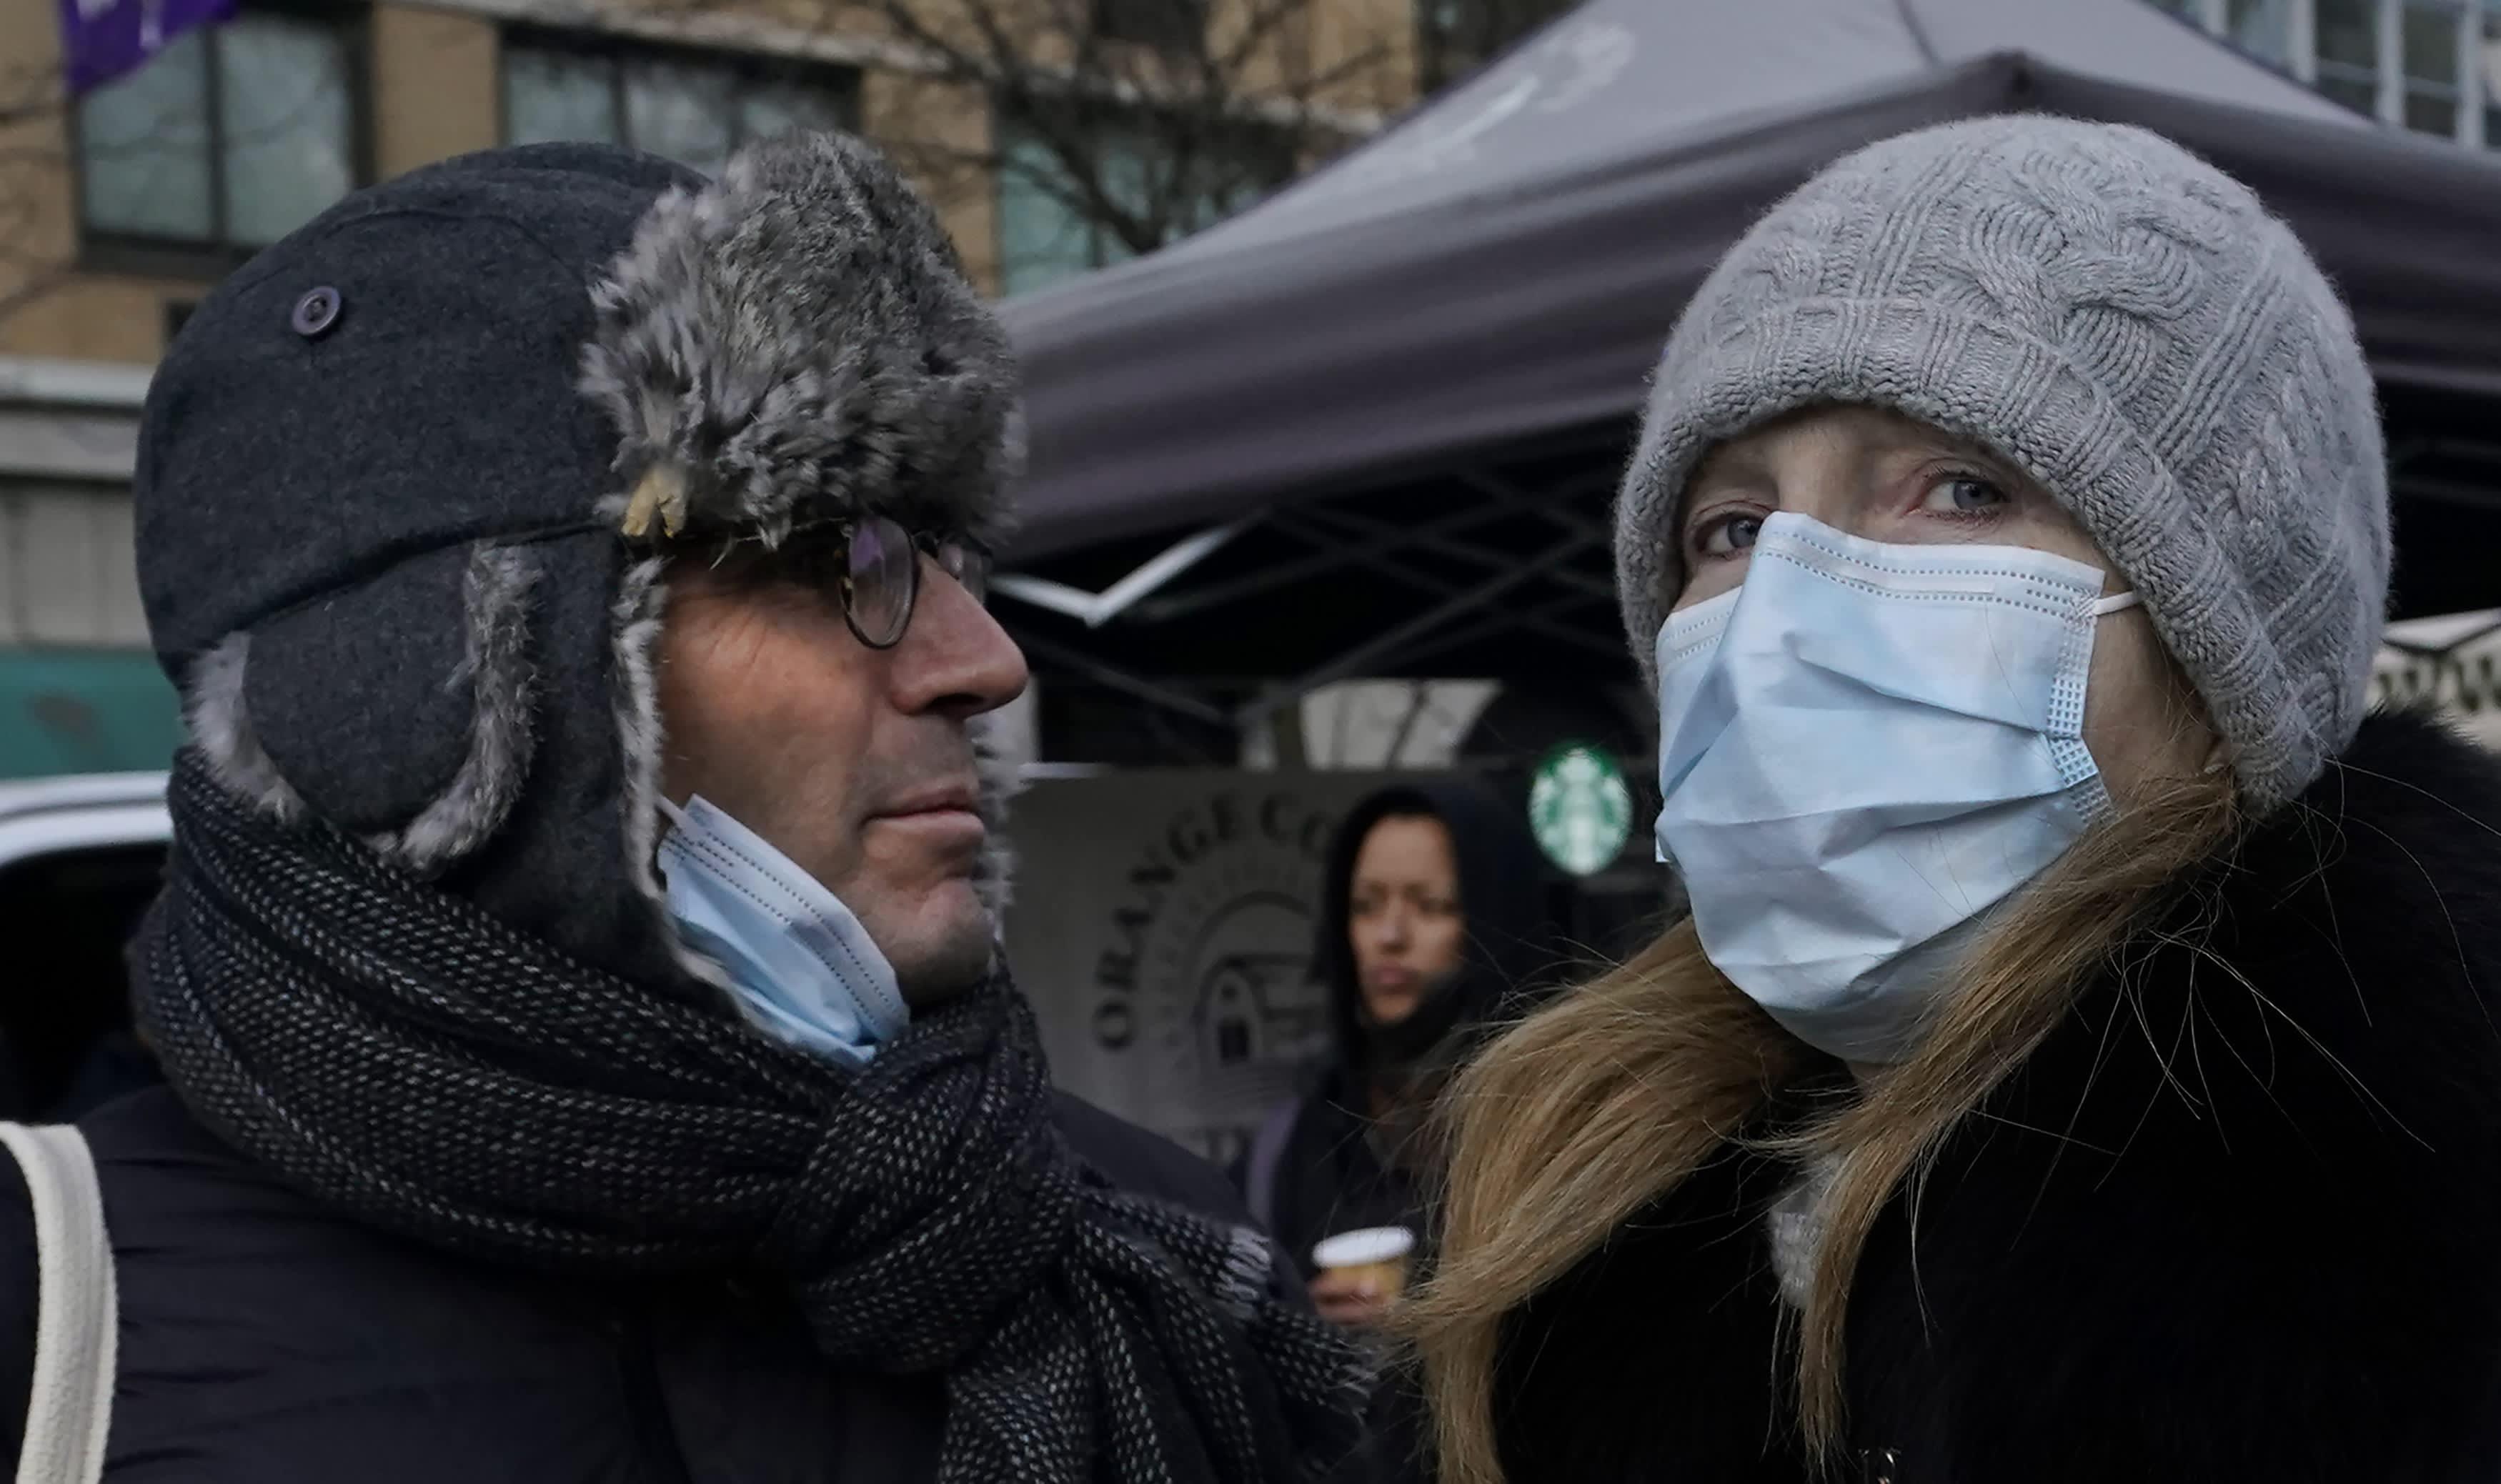 New York City confirms first coronavirus case